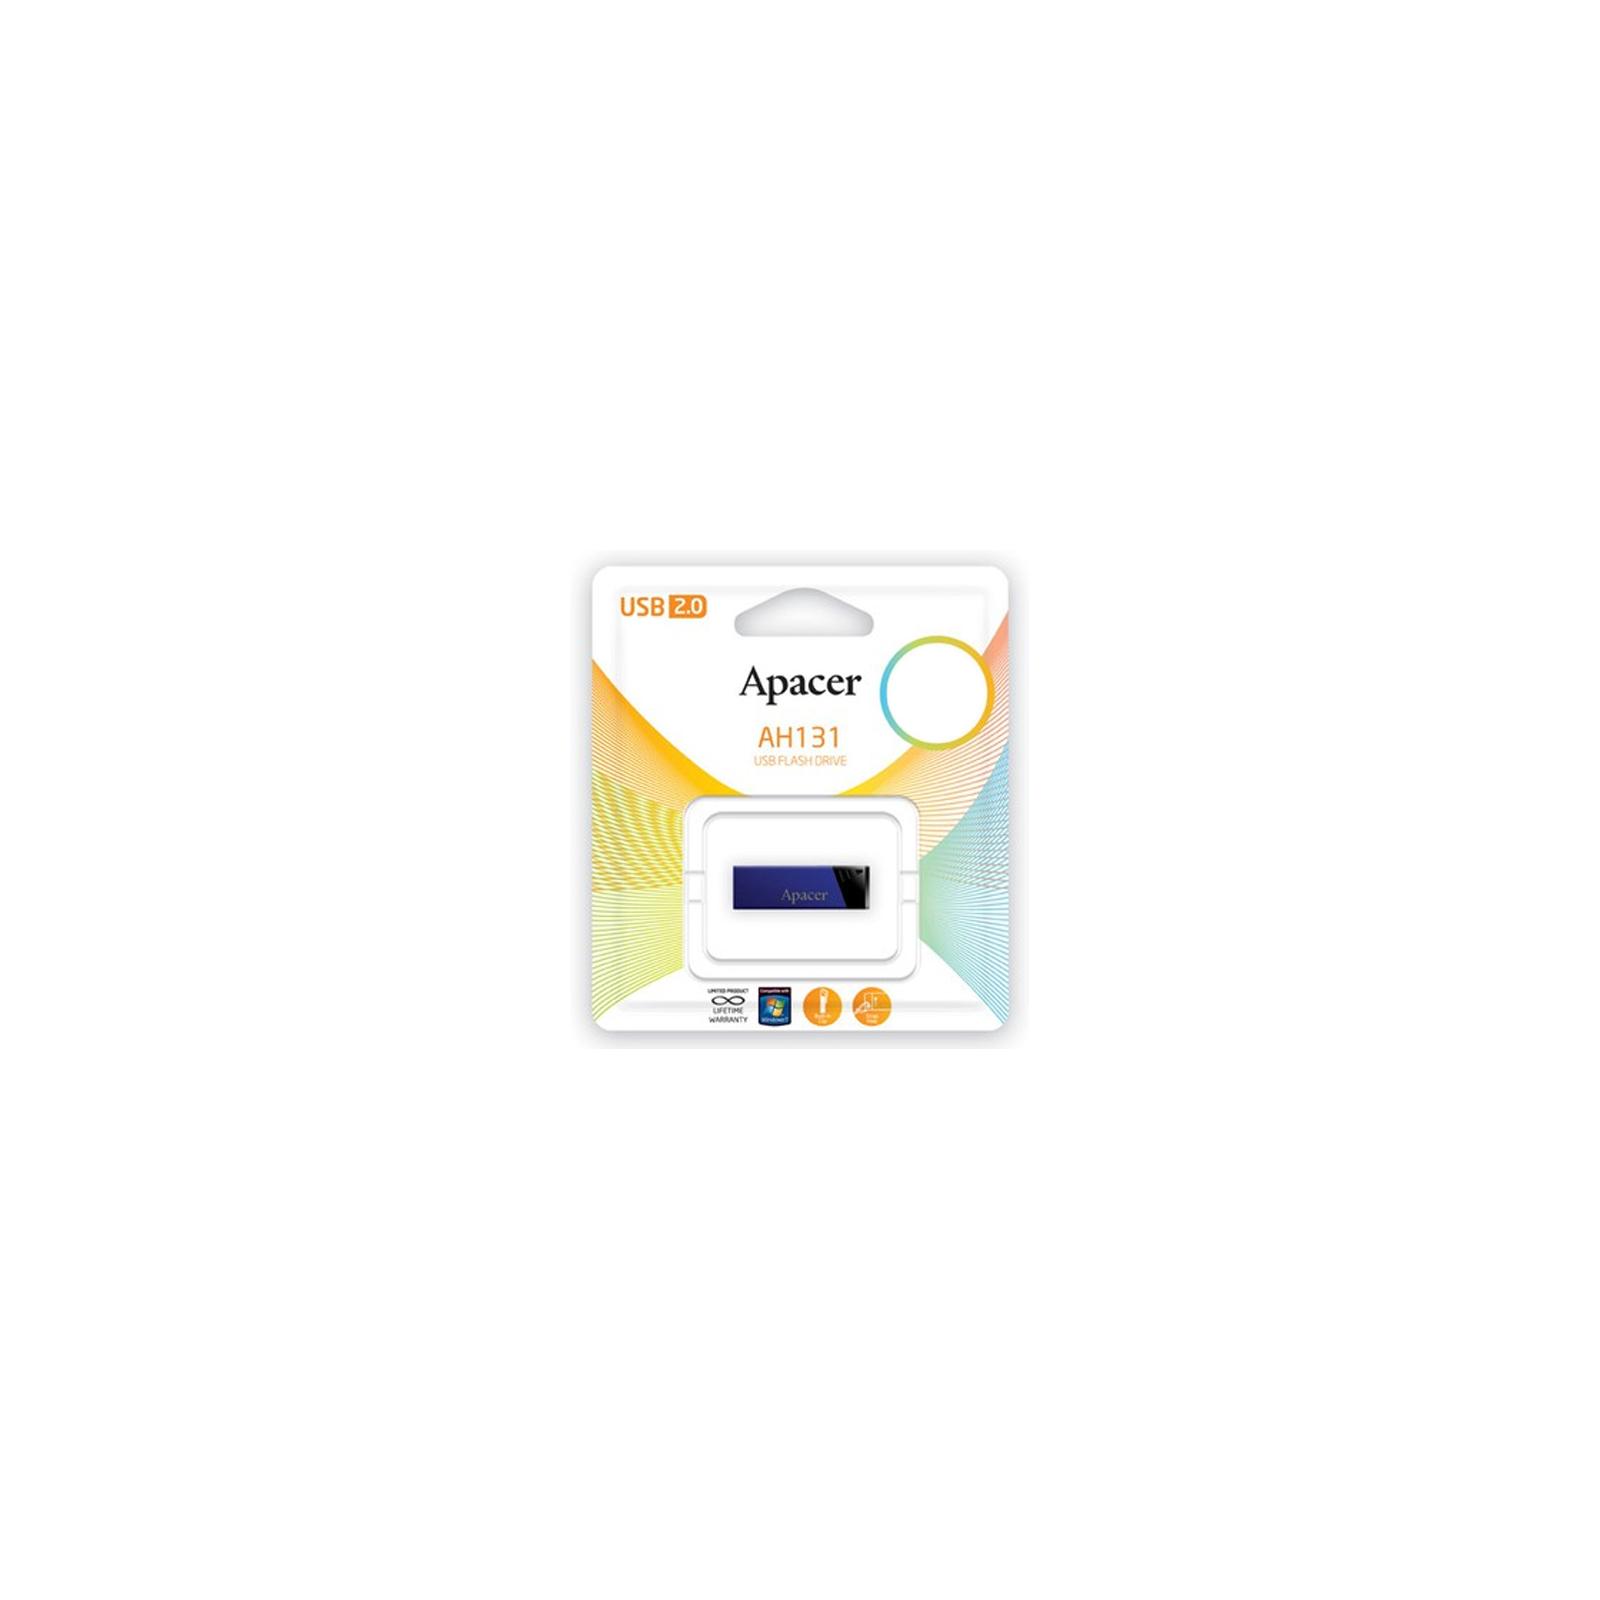 USB флеш накопитель 32GB AH131 Blue RP USB2.0 Apacer (AP32GAH131U-1) изображение 4